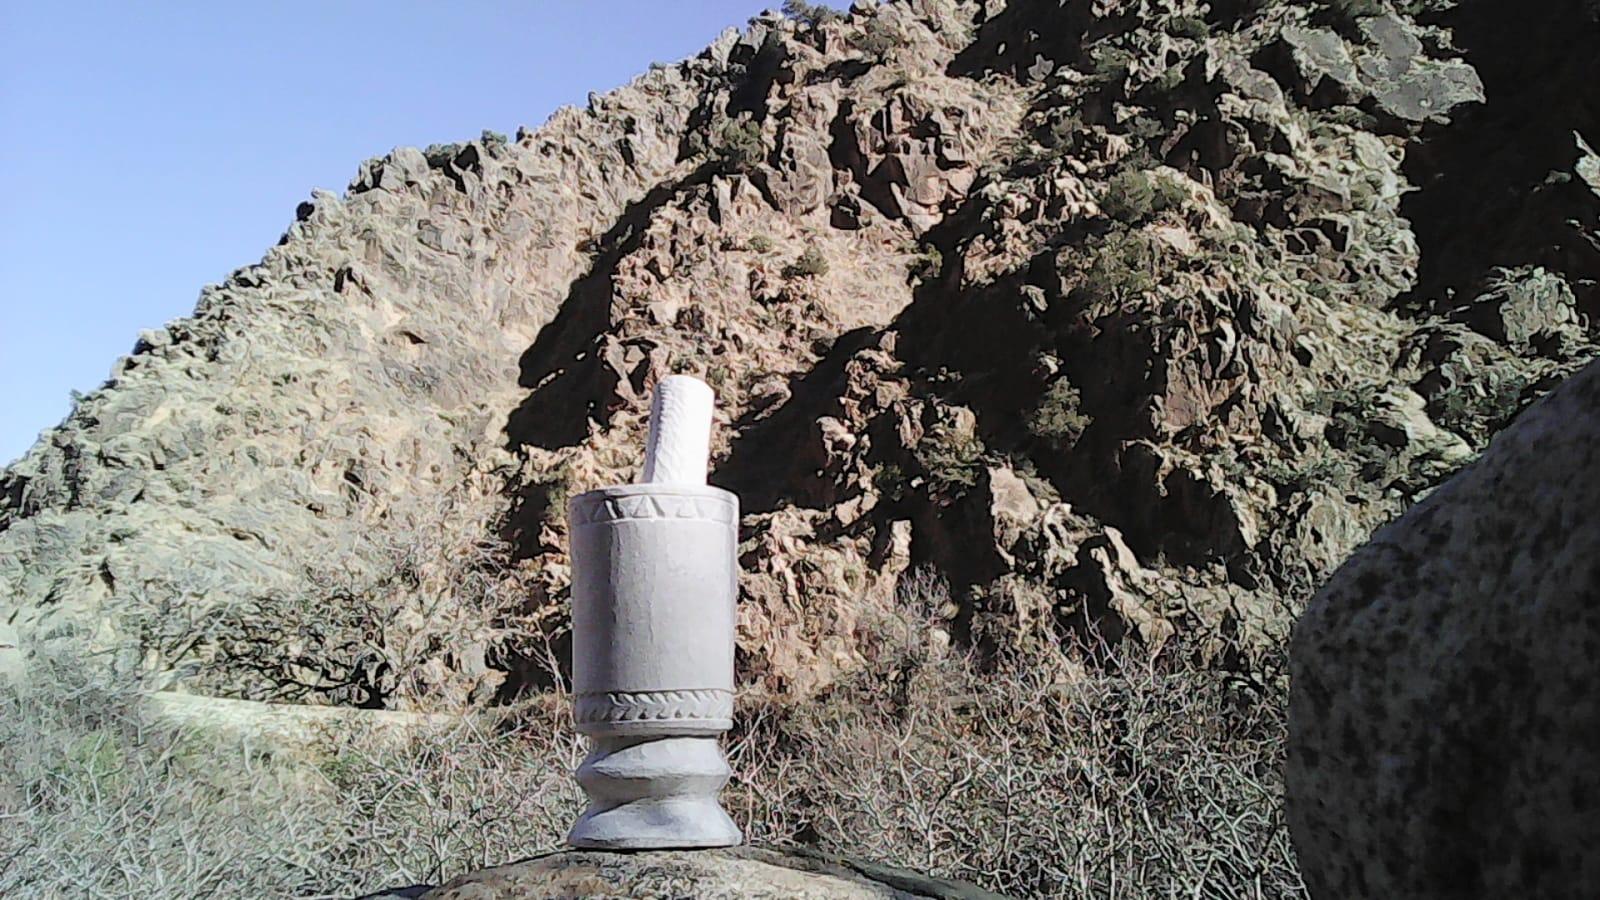 Mortar and Pestle Stone White Morocco